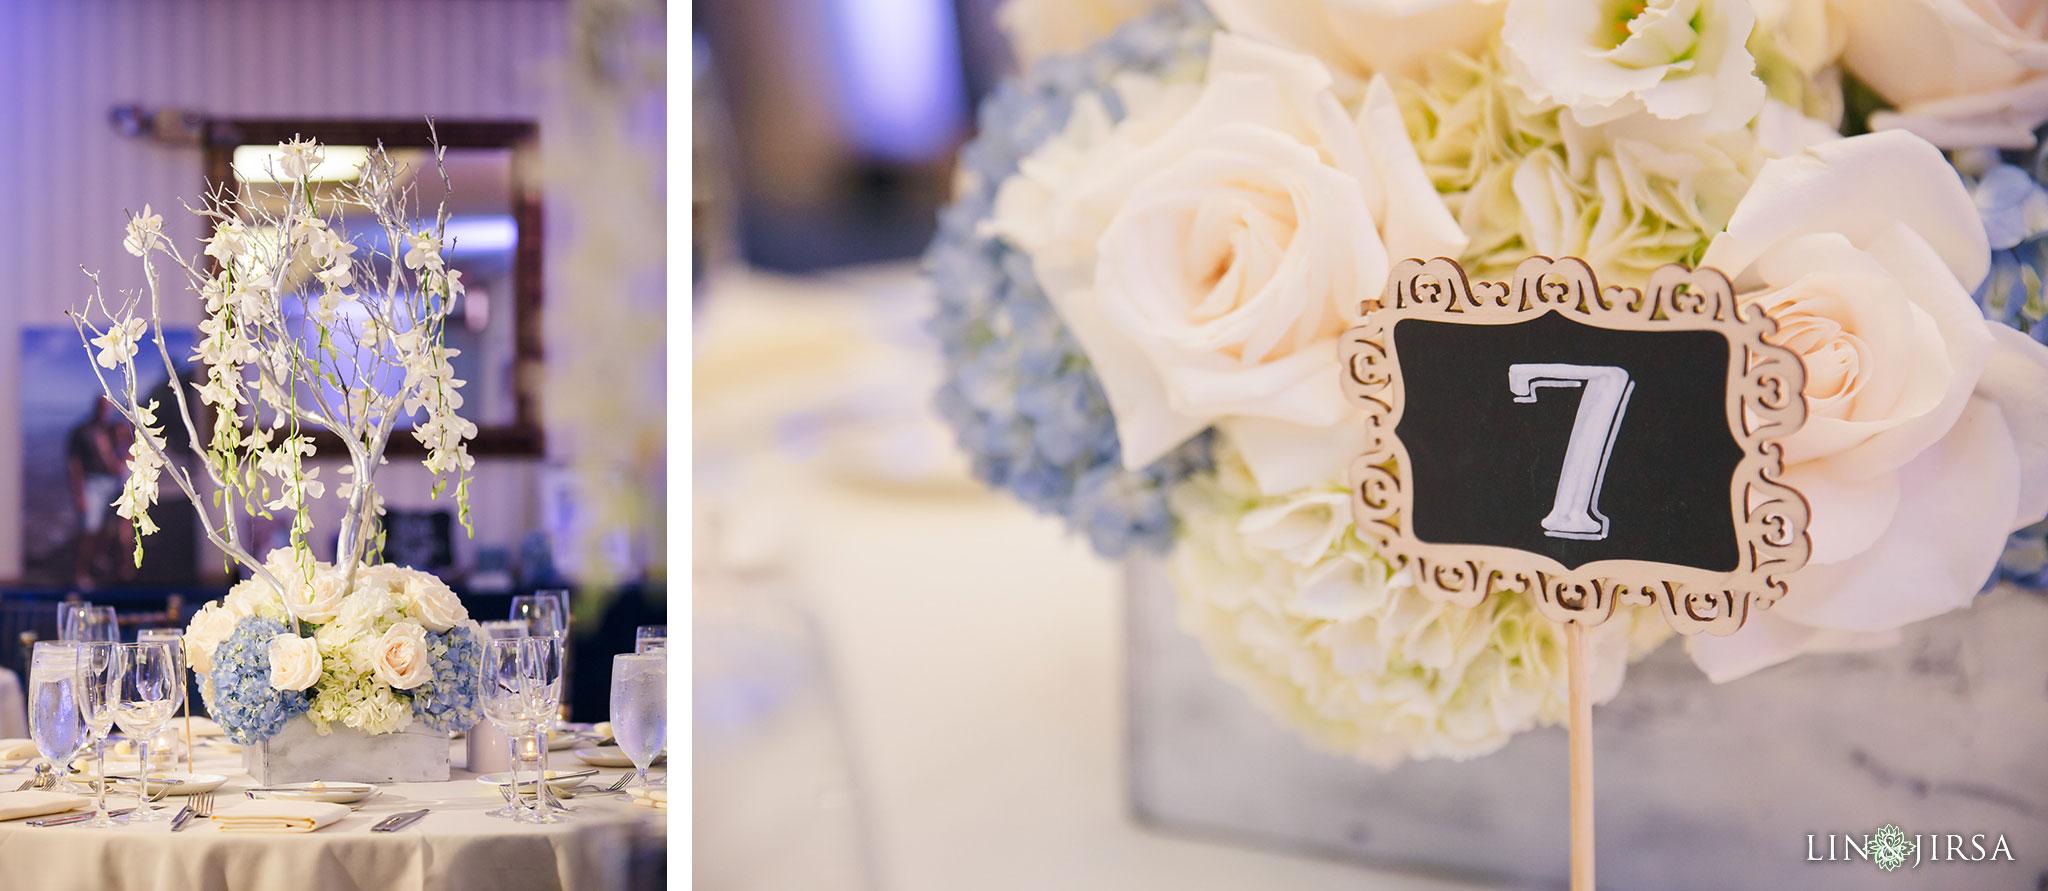 27 Portofino Hotel Redondo Beach Wedding Photography